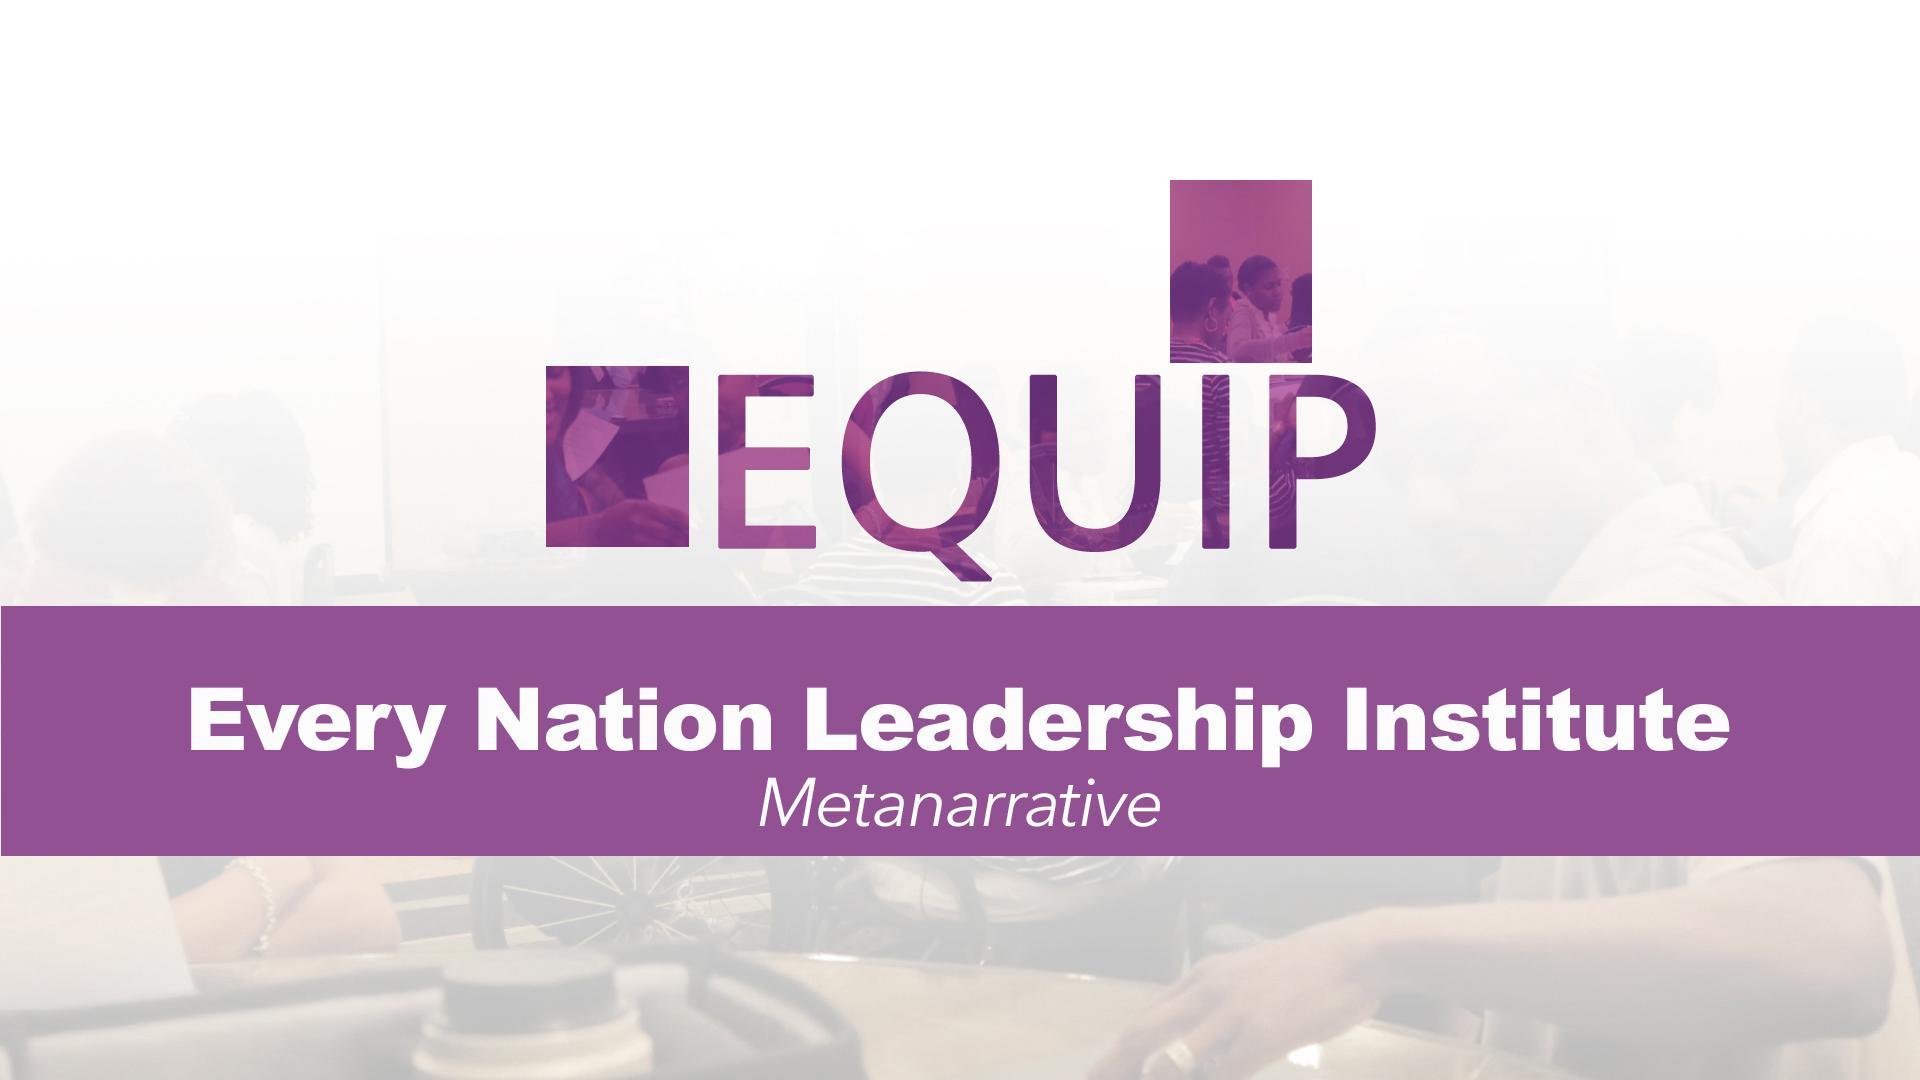 ENLI Year 2 - One Semester 2 Class (Metanarrative)